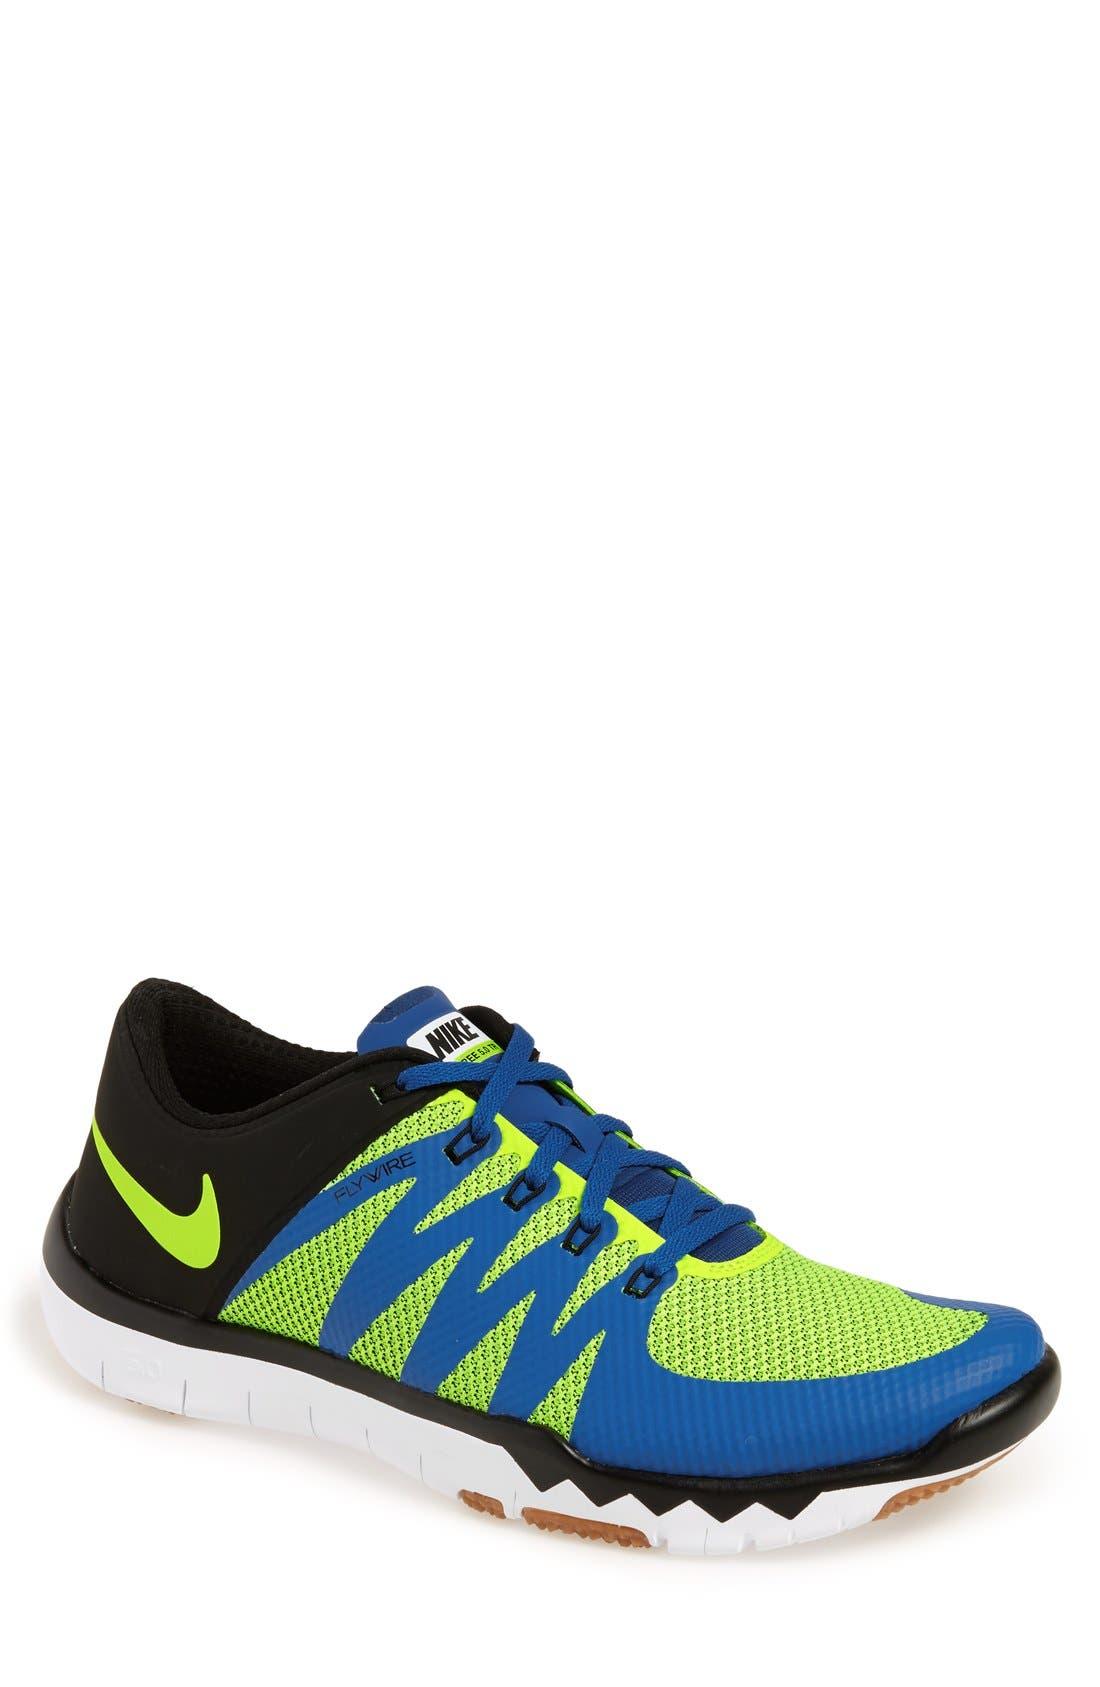 Nike Free Trainer 5.0 V6 Carte Nordstrom